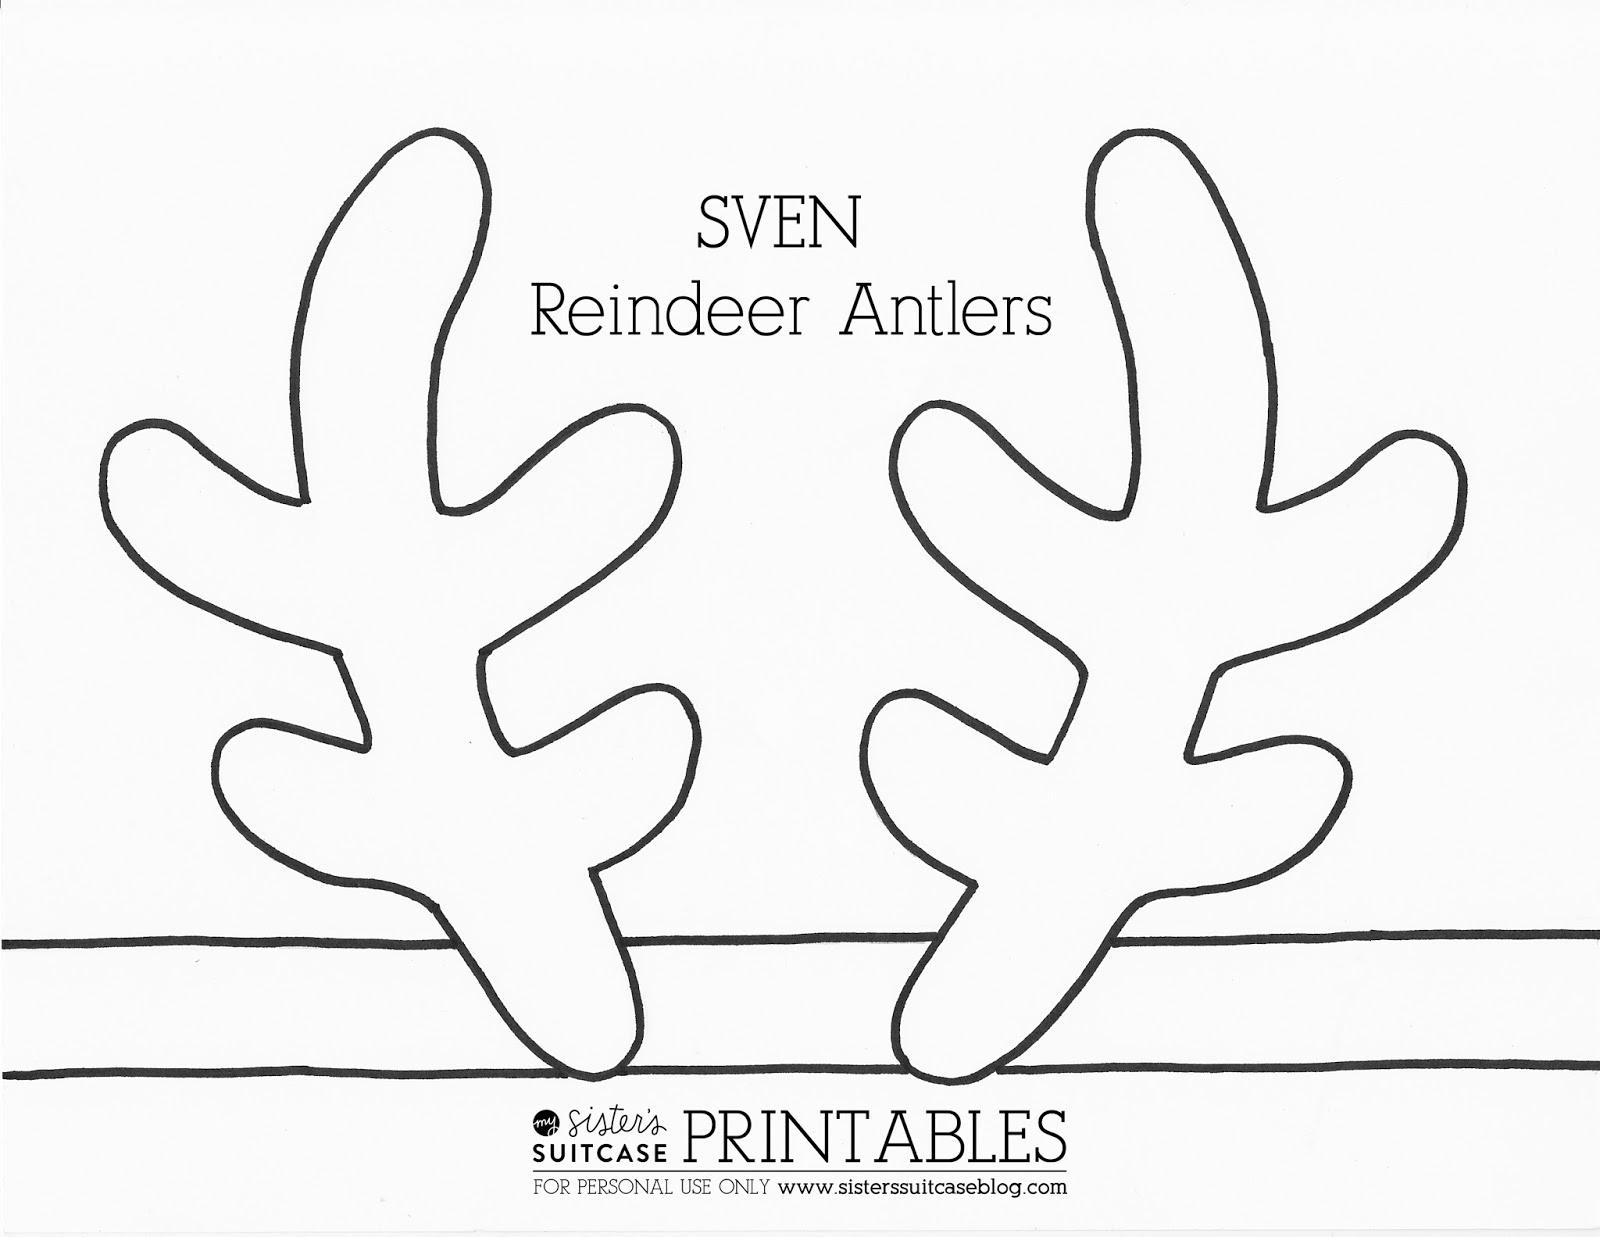 It is an image of Printable Reindeer Antler within printable template